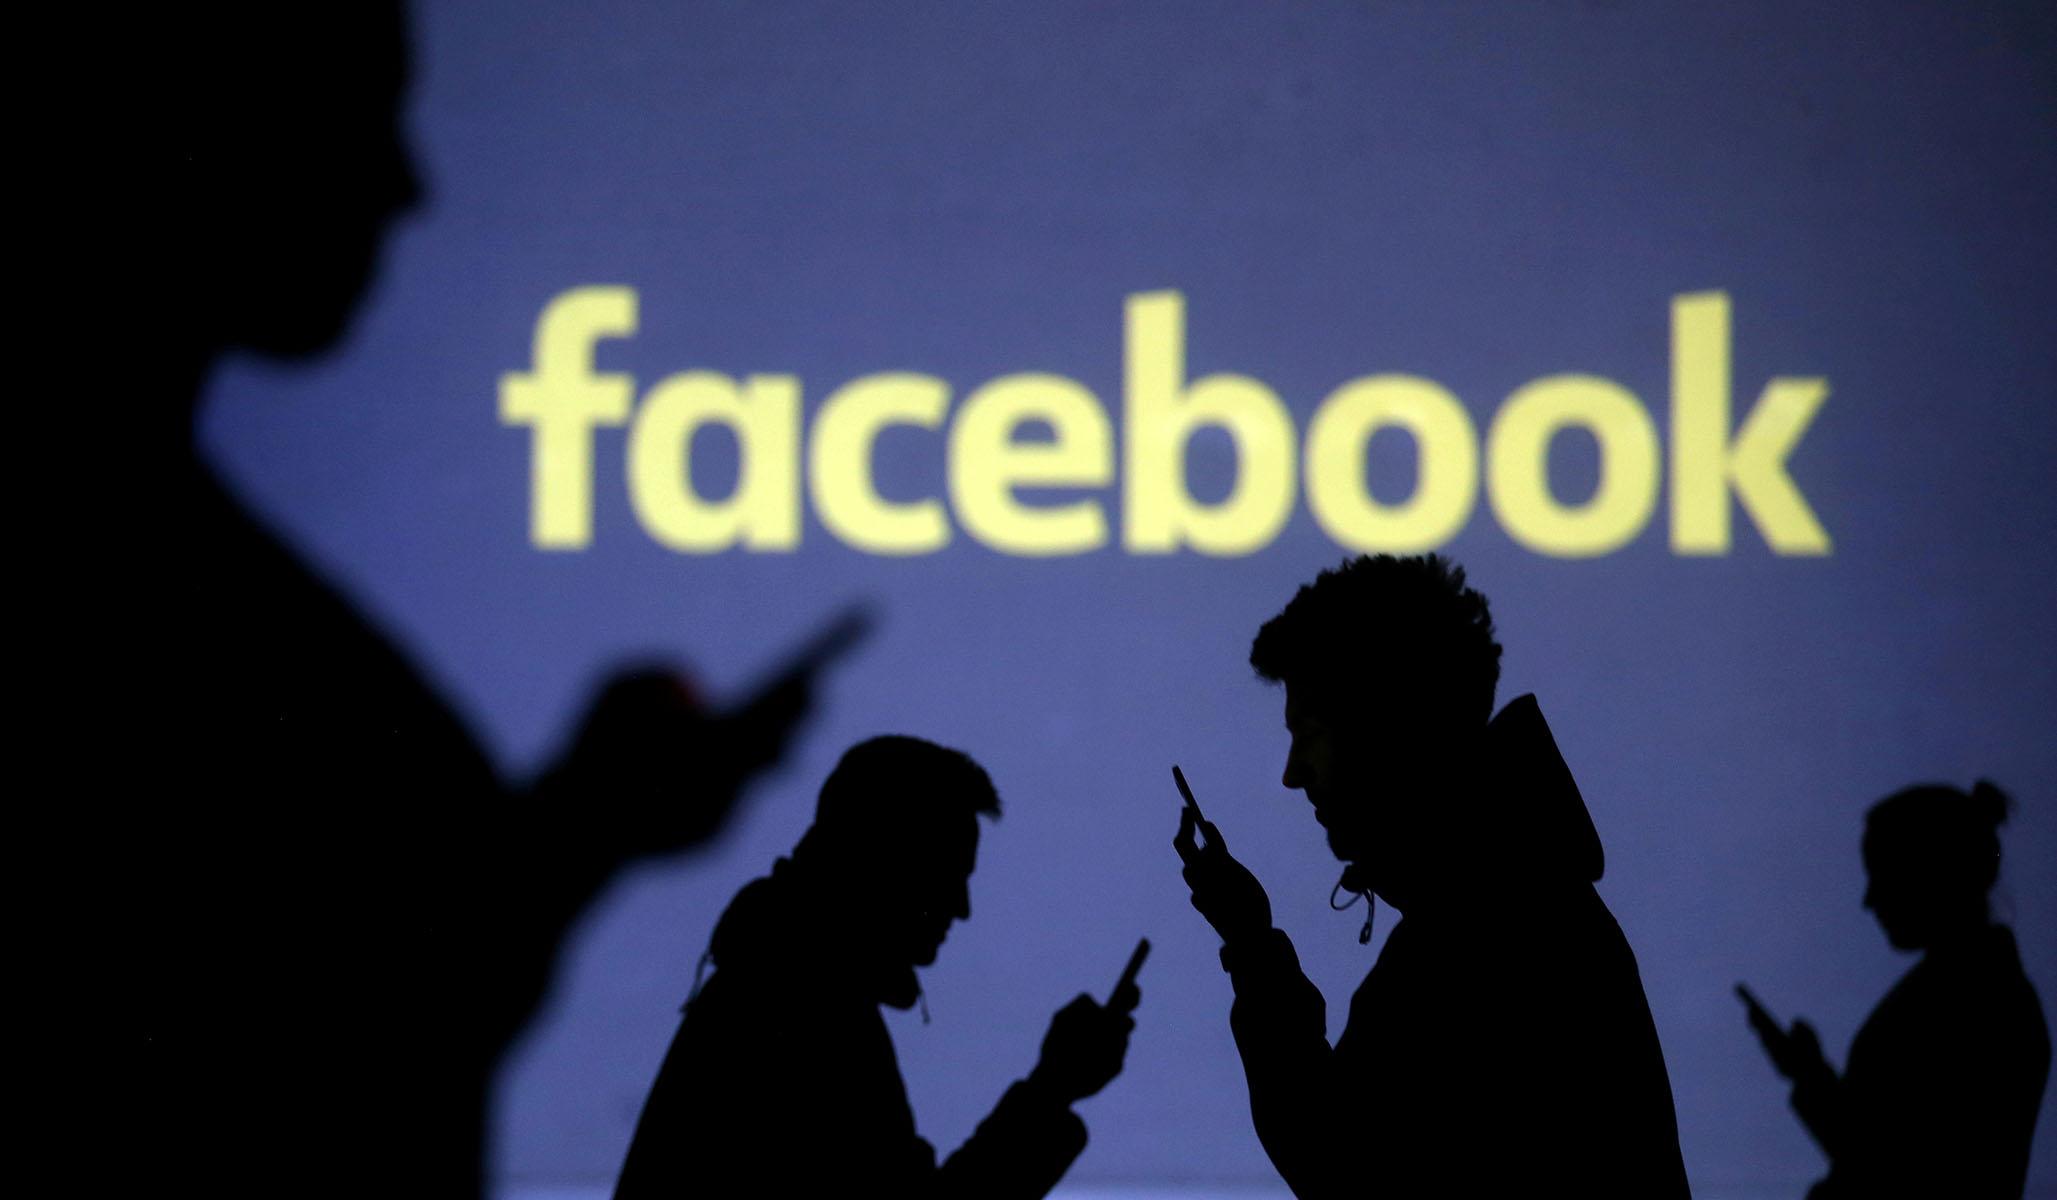 Four Republican Senators Write to Facebook over 'Censorship' of Pro-Life Content